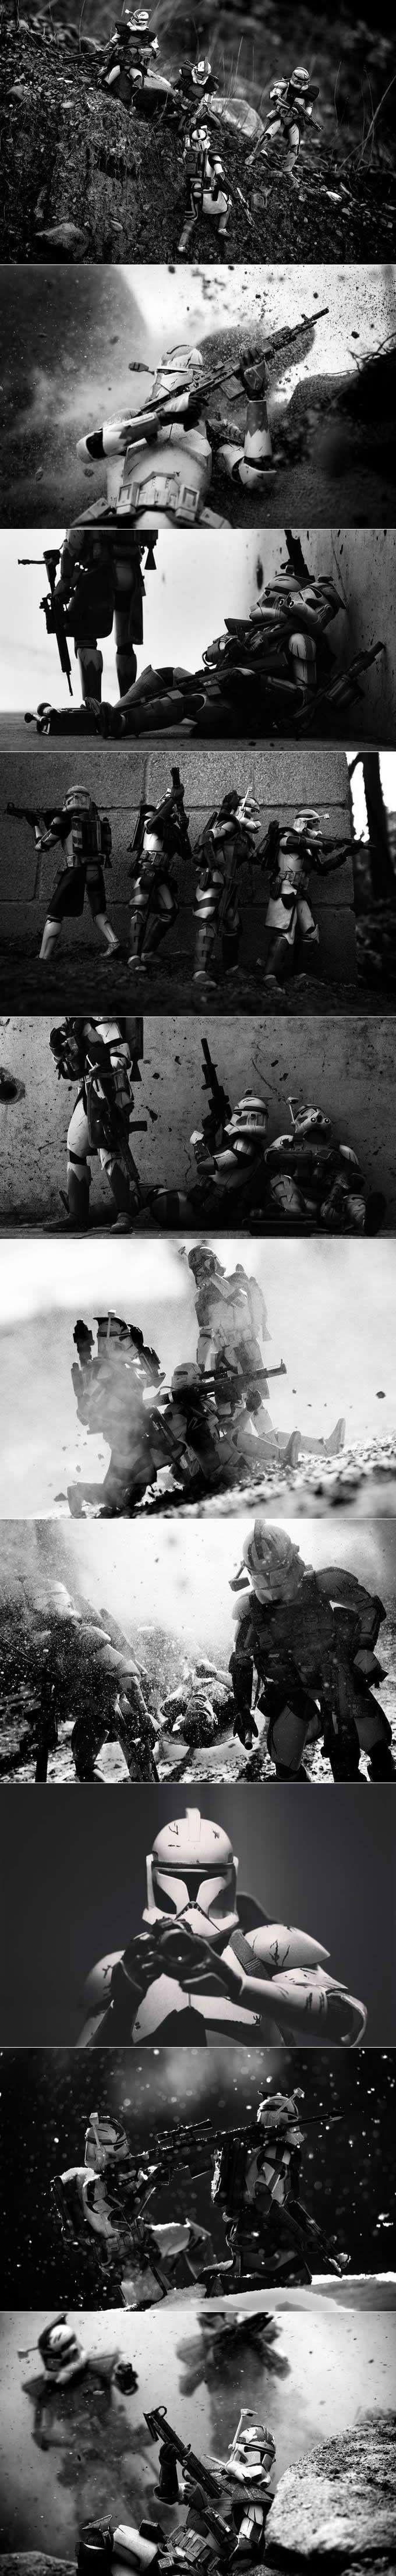 Humanizing soldier toys in Star Wars universe (Matthew Callahan)